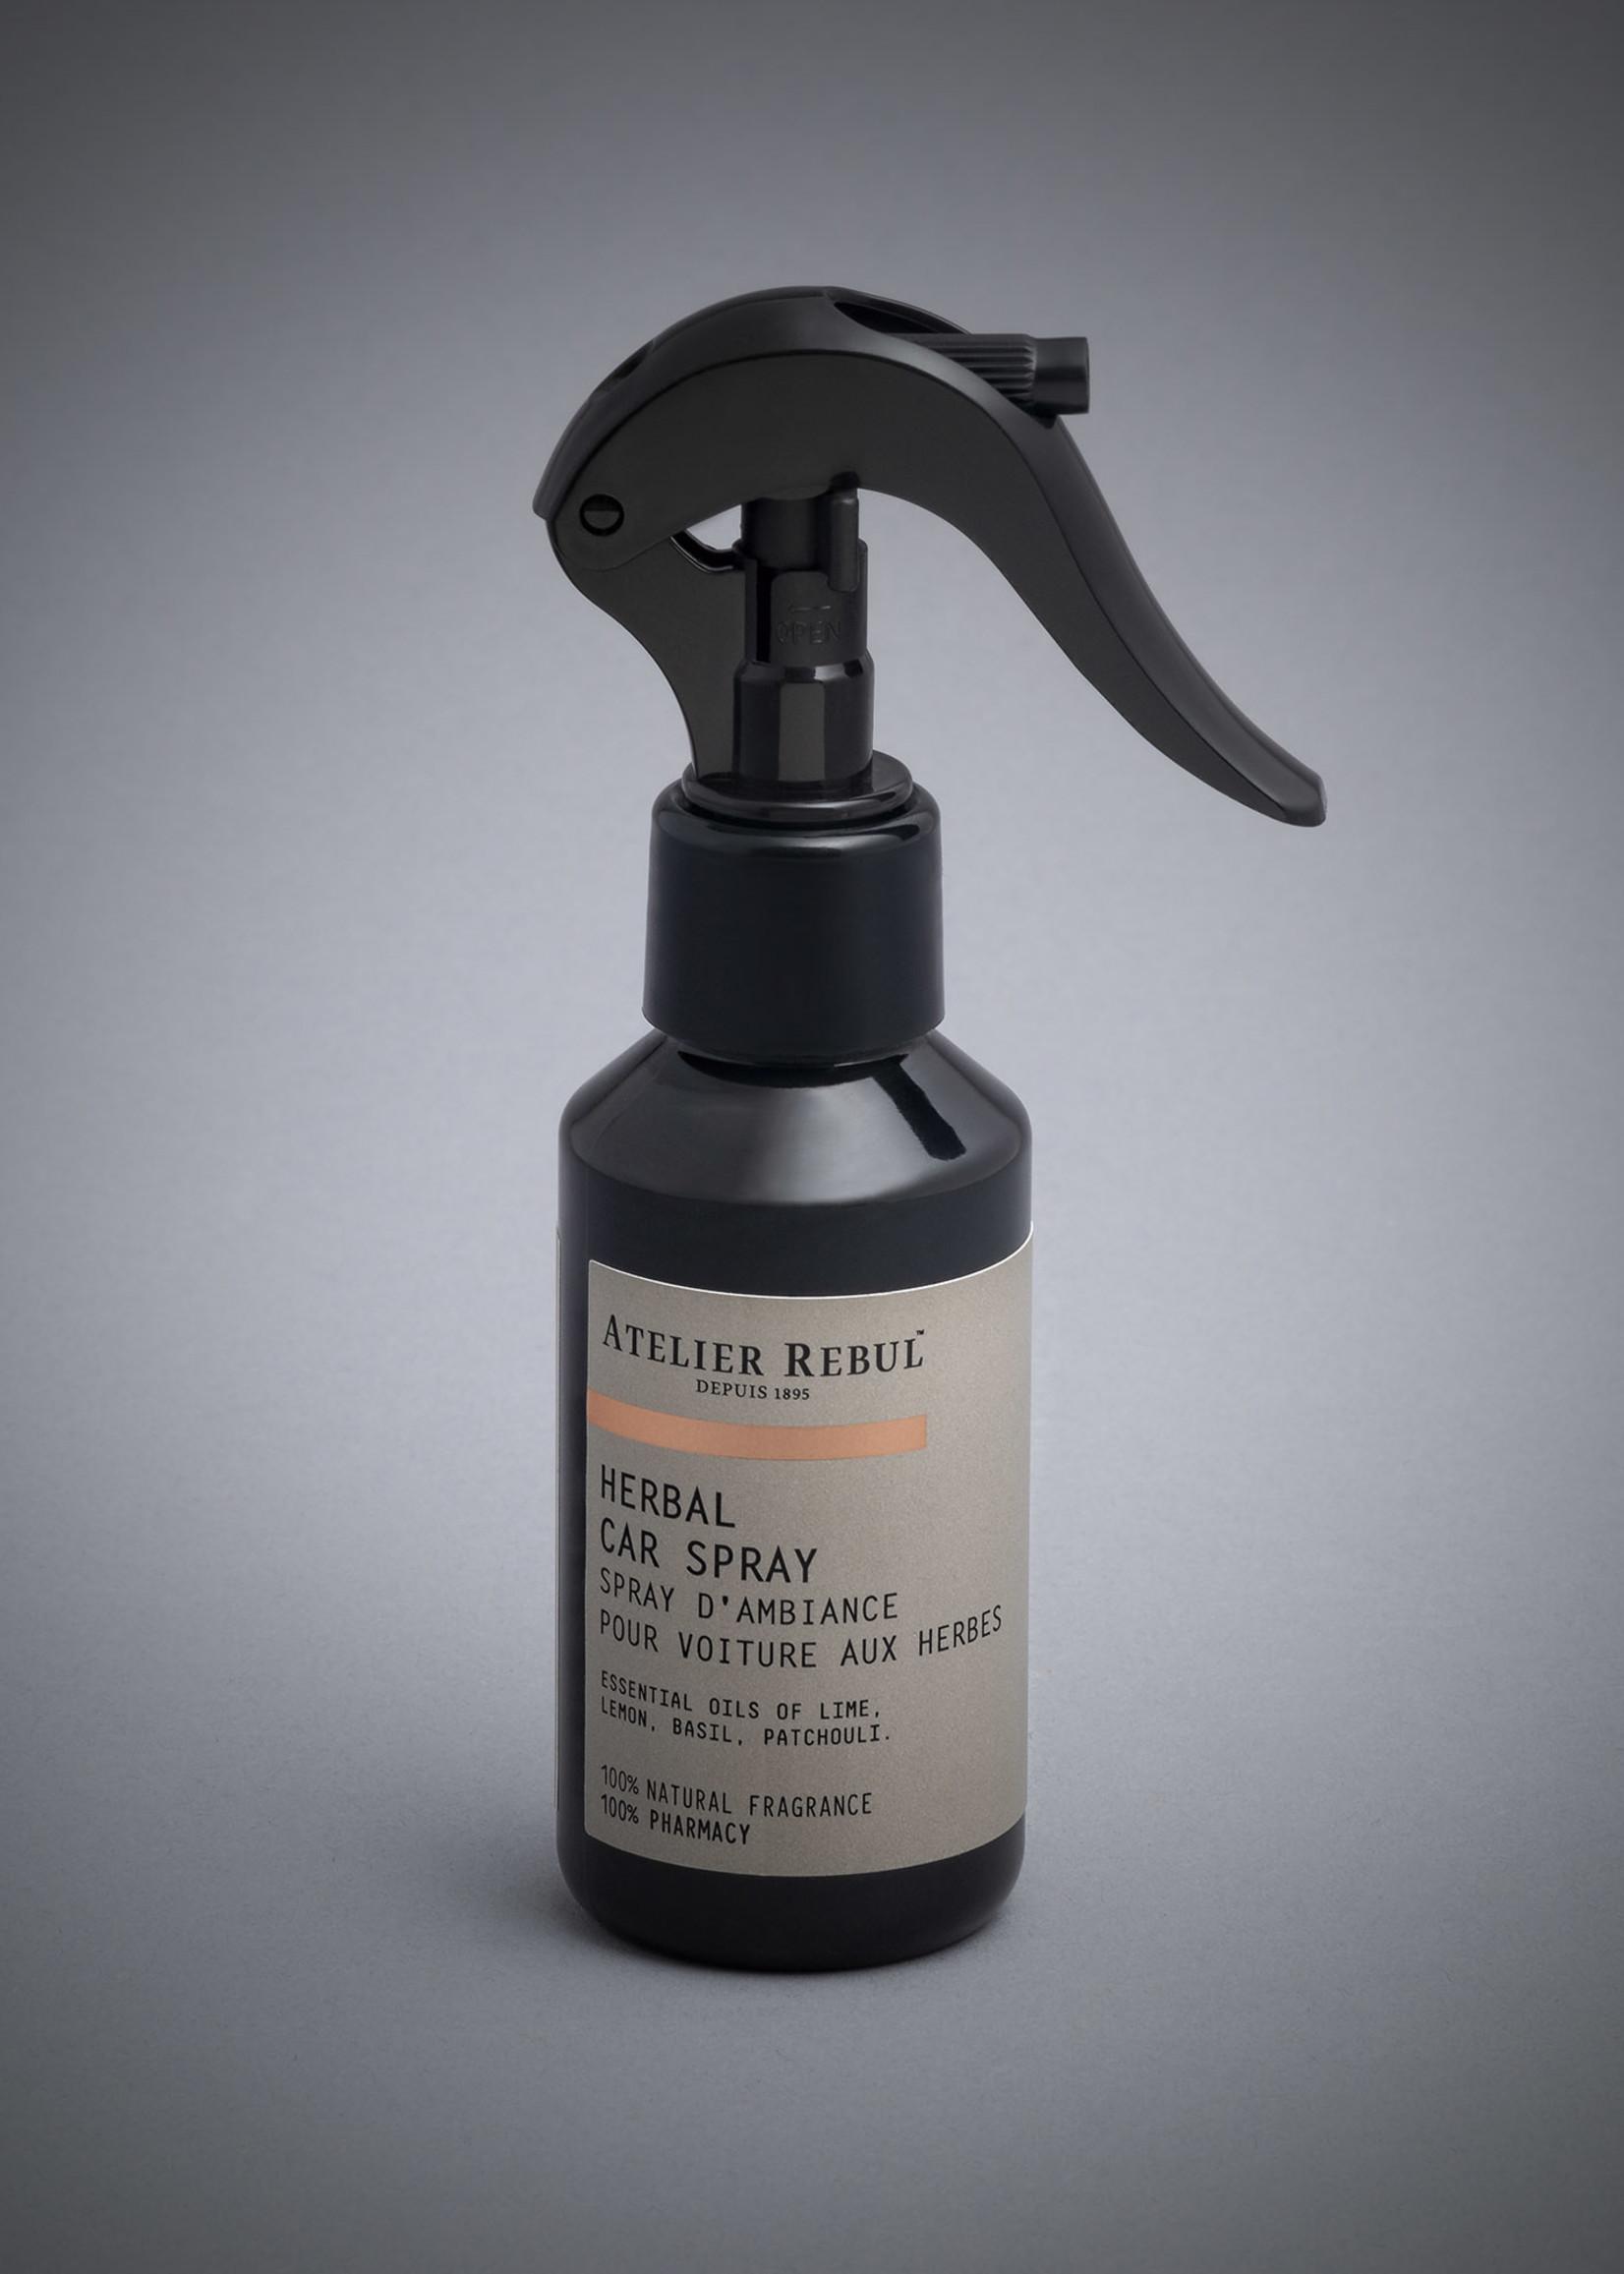 Atelier Rebul Pharmacy Herbal Car Spray 100ml